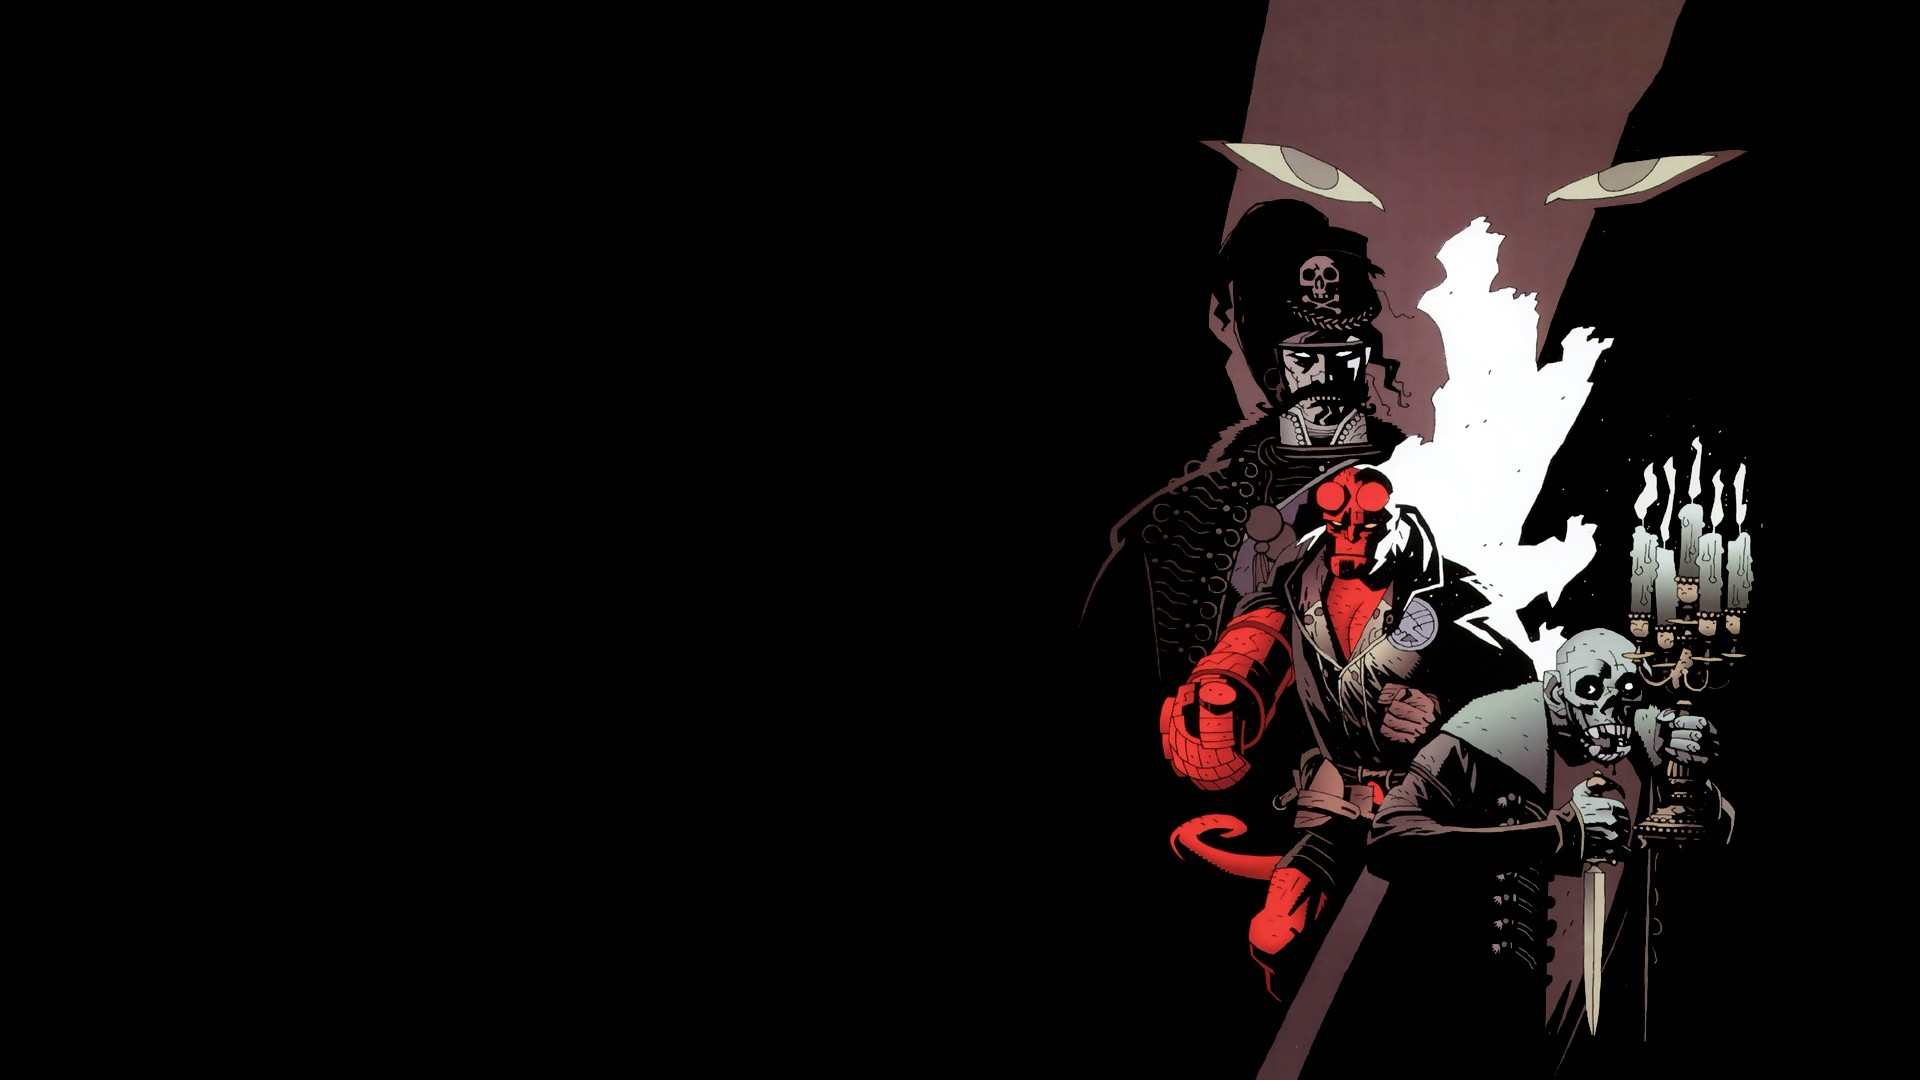 Comic Book Wallpapers For Desktop 77 Images